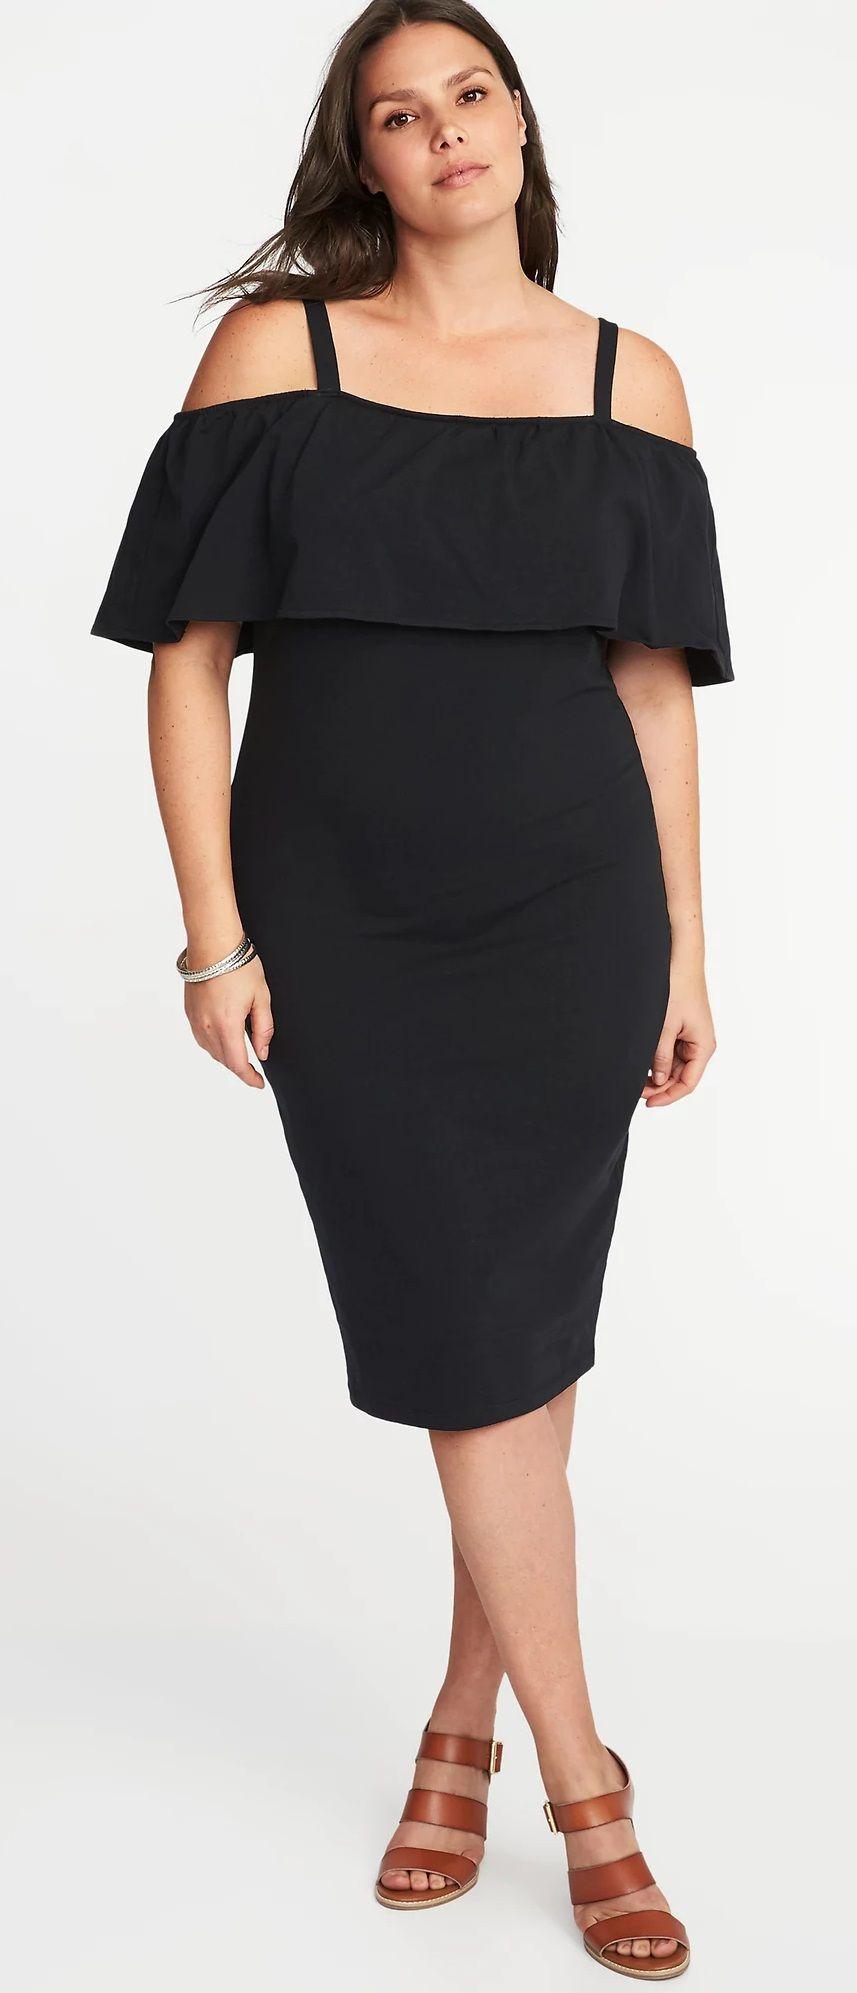 Plus size offtheshoulder bodycon dress plussizepartydress plus